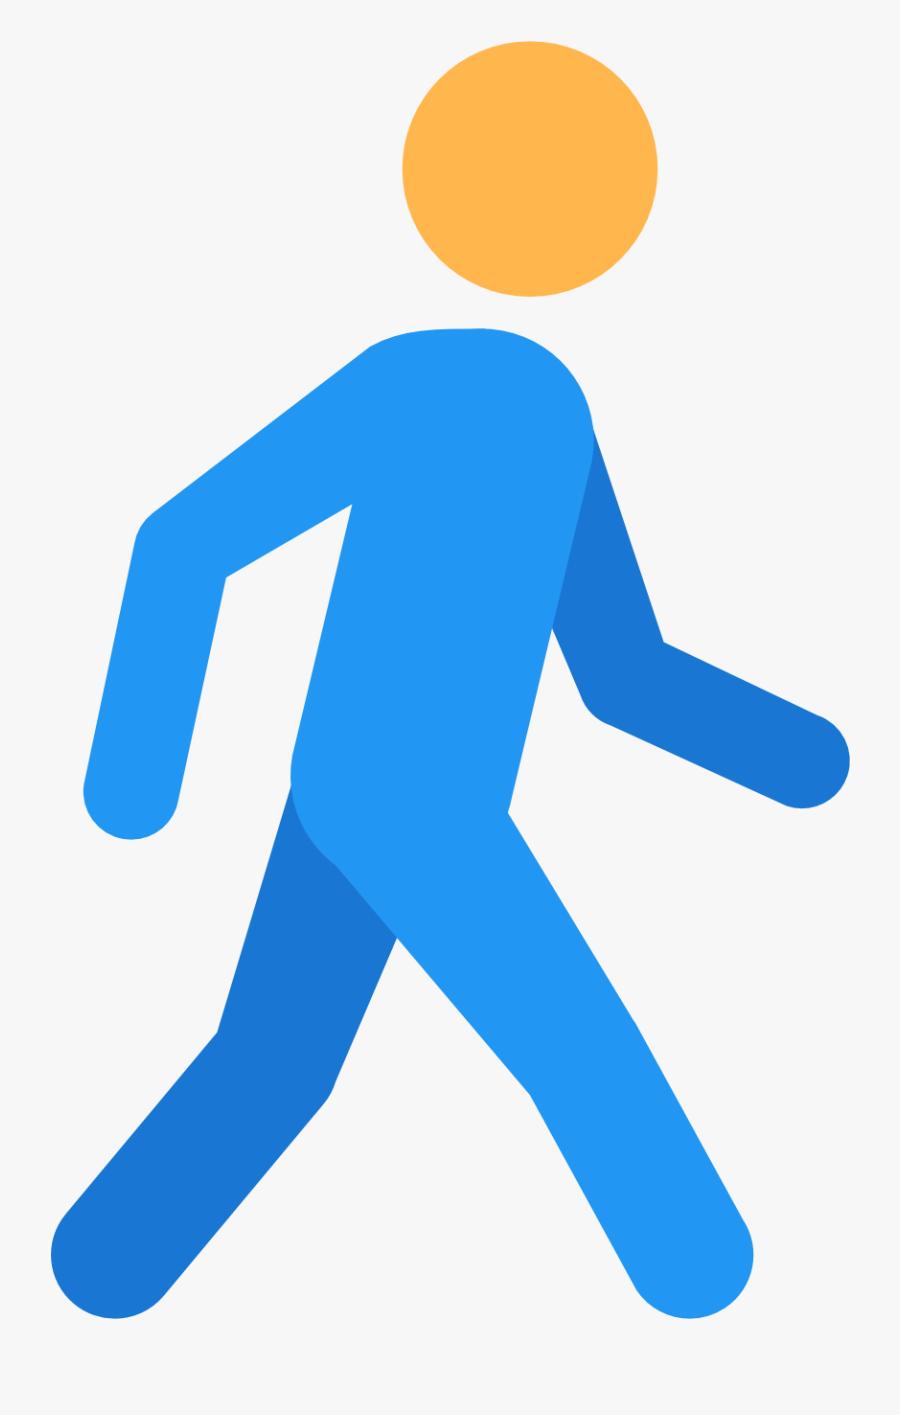 People Clipart Walking Stick Figure - Walk Png, Transparent Clipart